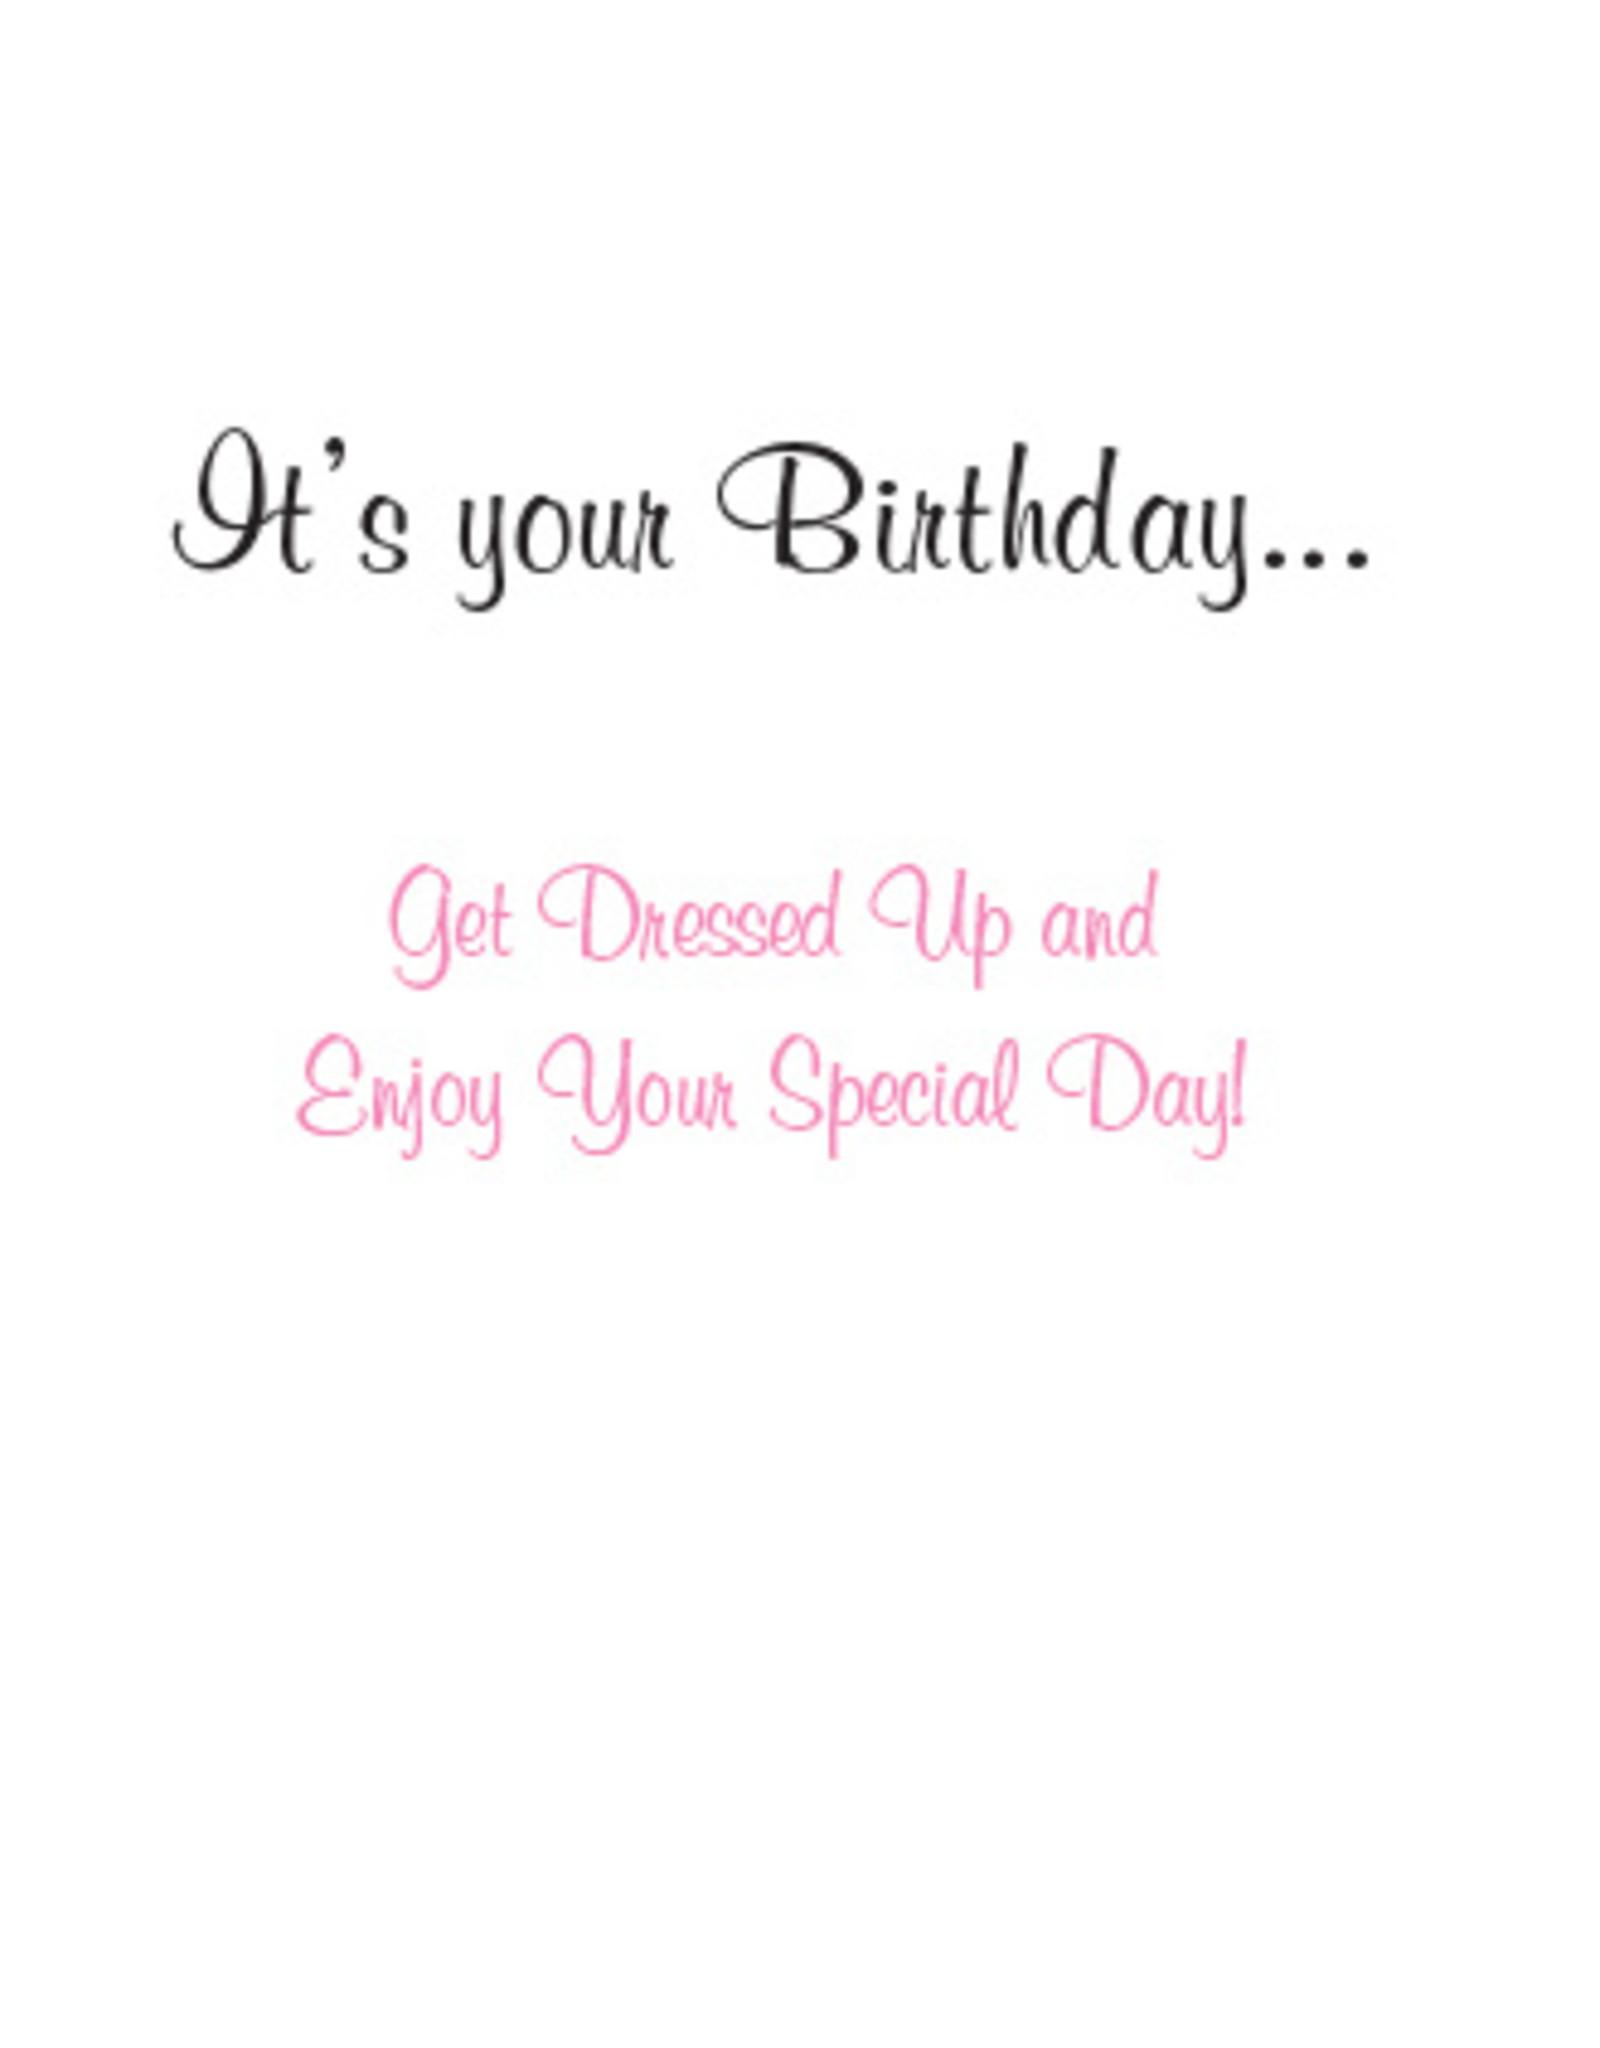 DOG SPEAK Ballerina Golden Retriever Birthday Card